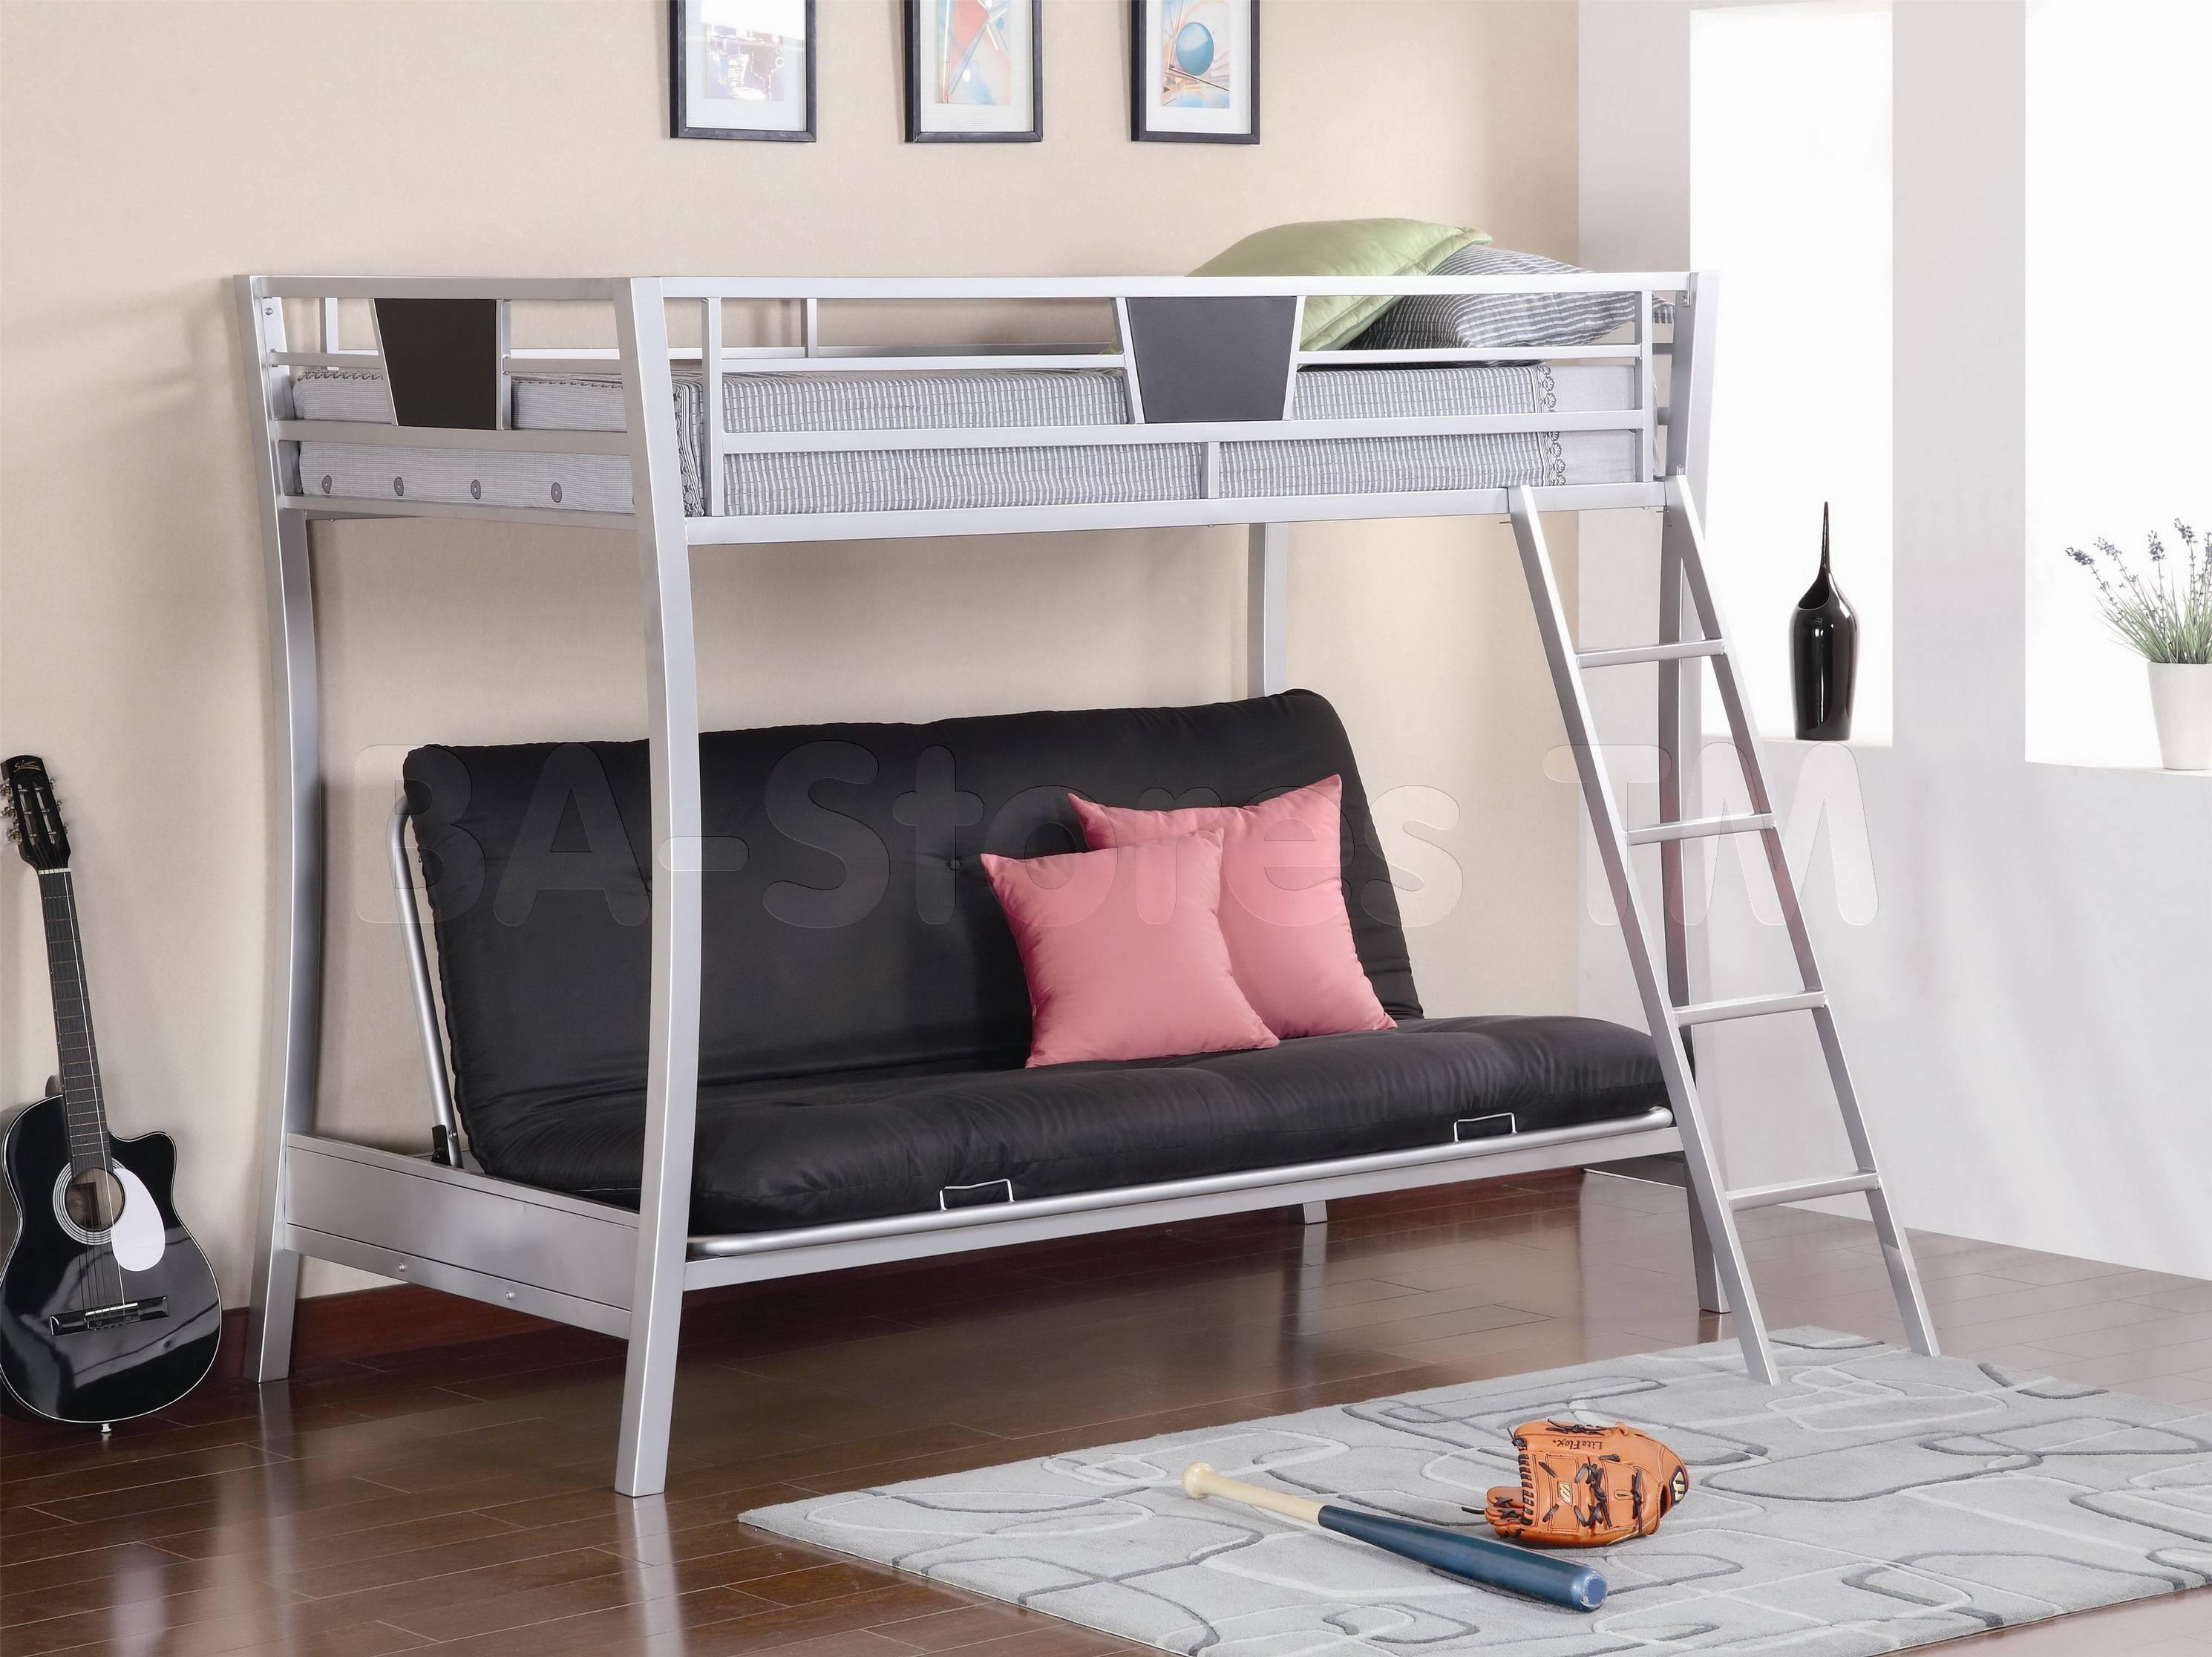 Sofa Bunk Beds | Beds Decoration with Sofa Bunk Beds (Image 24 of 30)